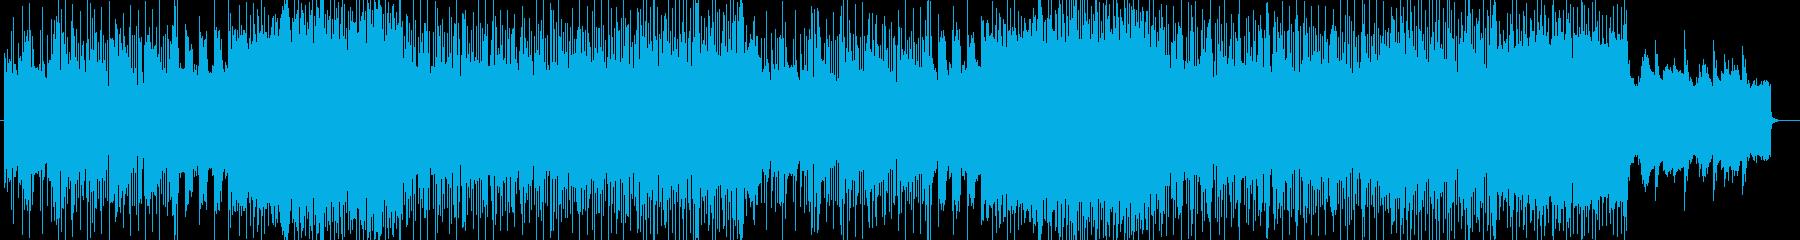 「HR/HM」「DARK」BGM132の再生済みの波形